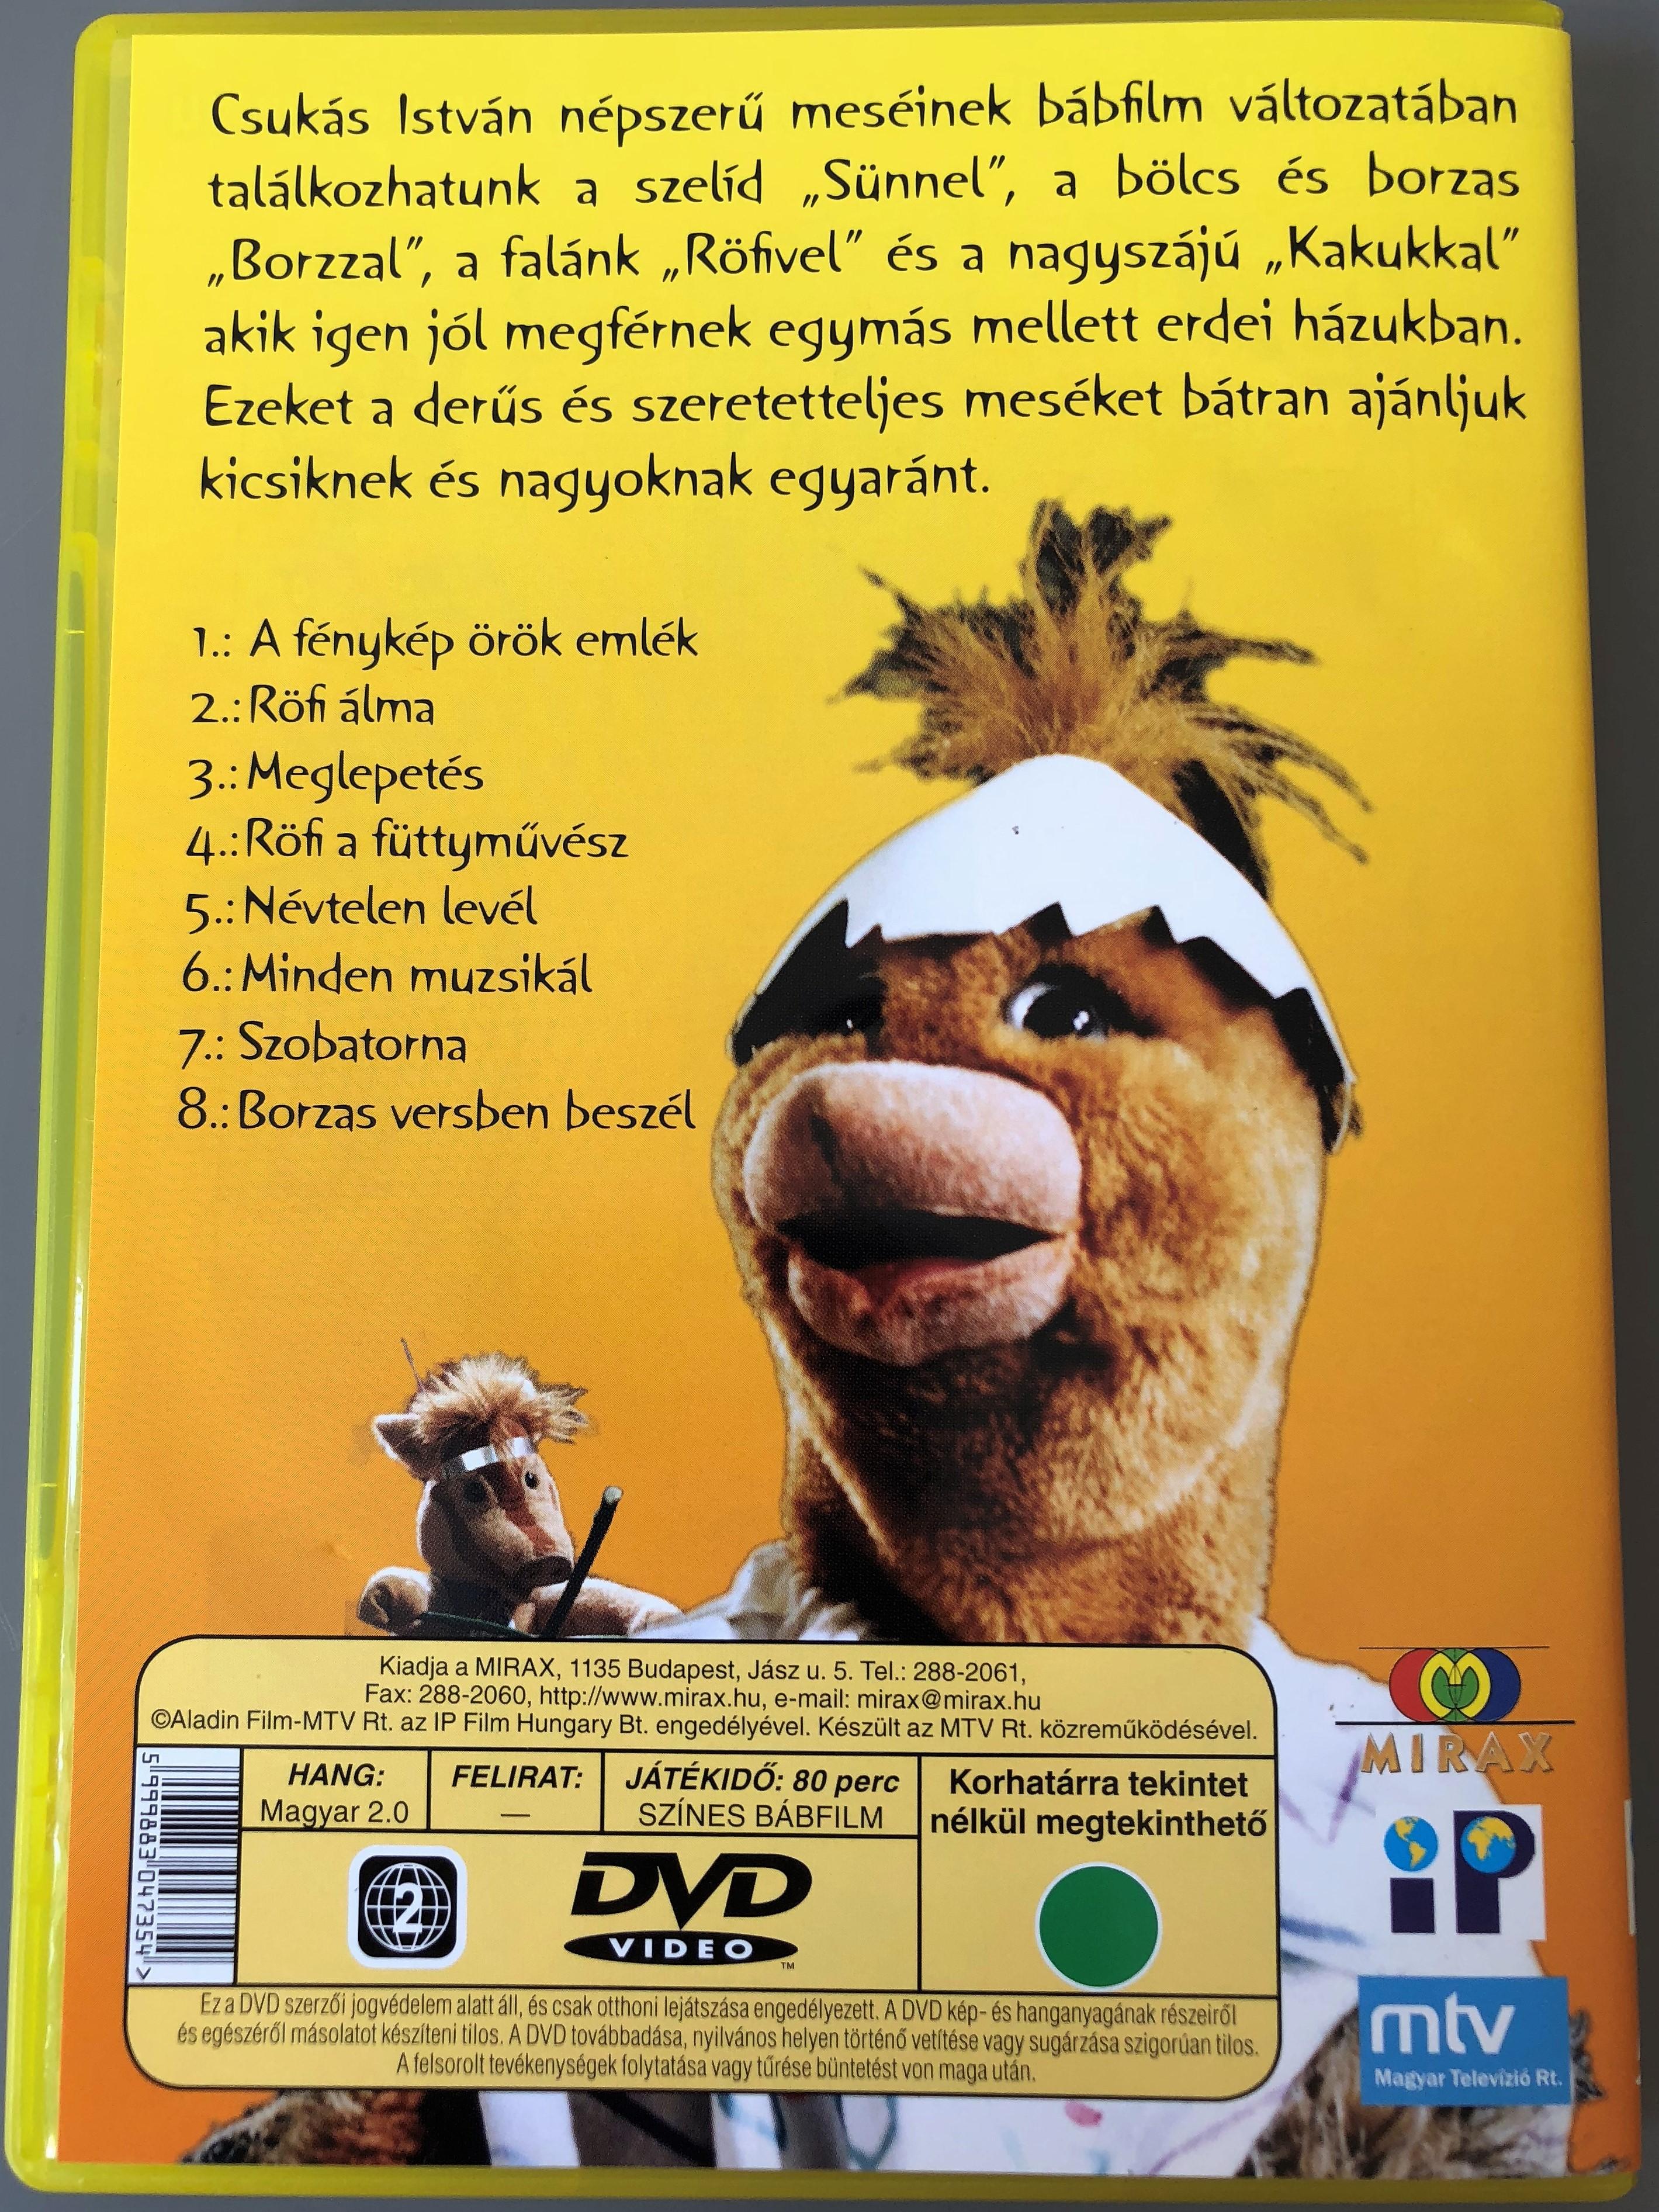 s-ni-s-bar-tai-dvd-written-by-csuk-s-istv-n-mtv-meset-r-dvd-1.-hungarian-puppet-movie-8-episodes-2-.jpg